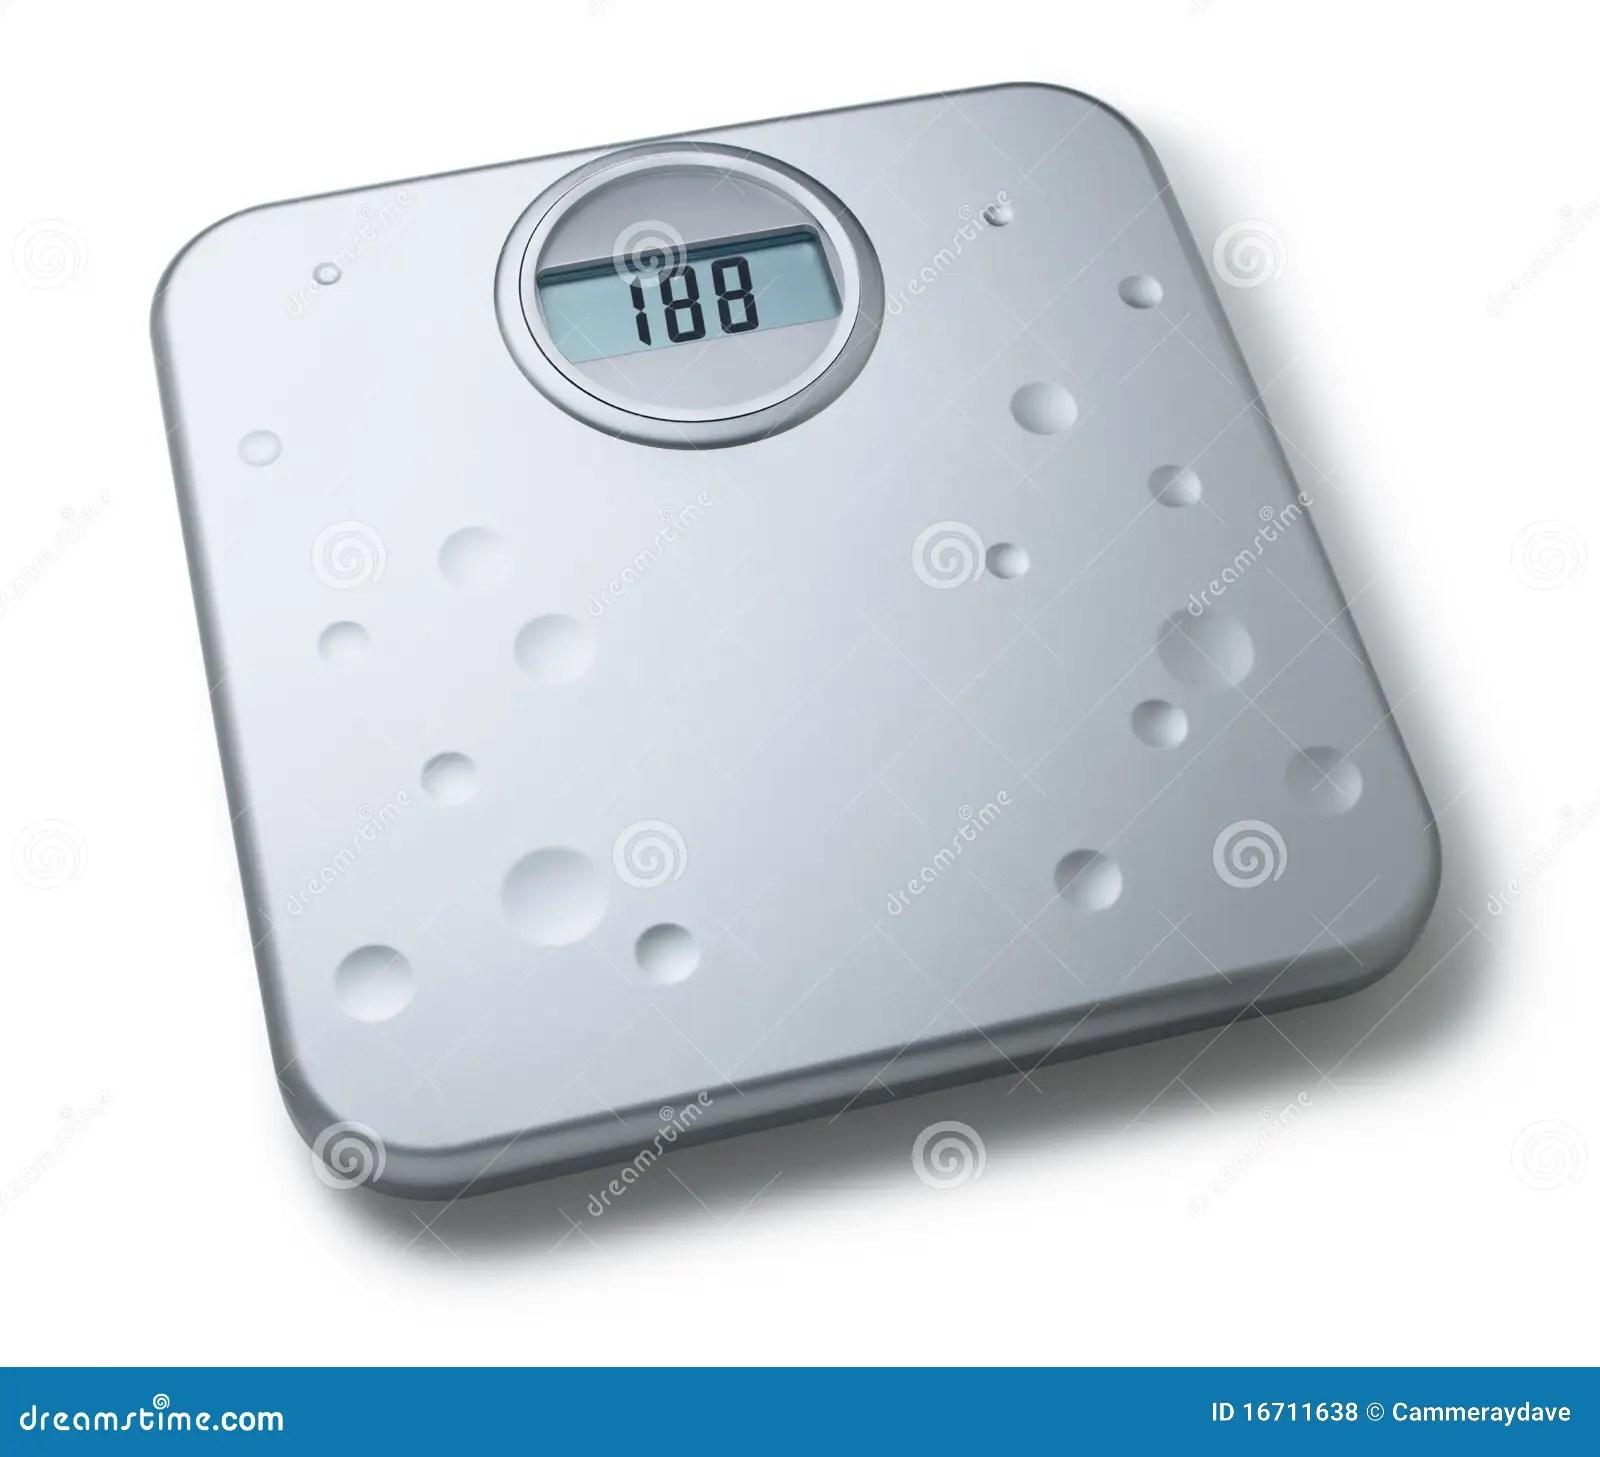 Digital Bathroom Scales Royalty Free Stock Photos  Image 16711638